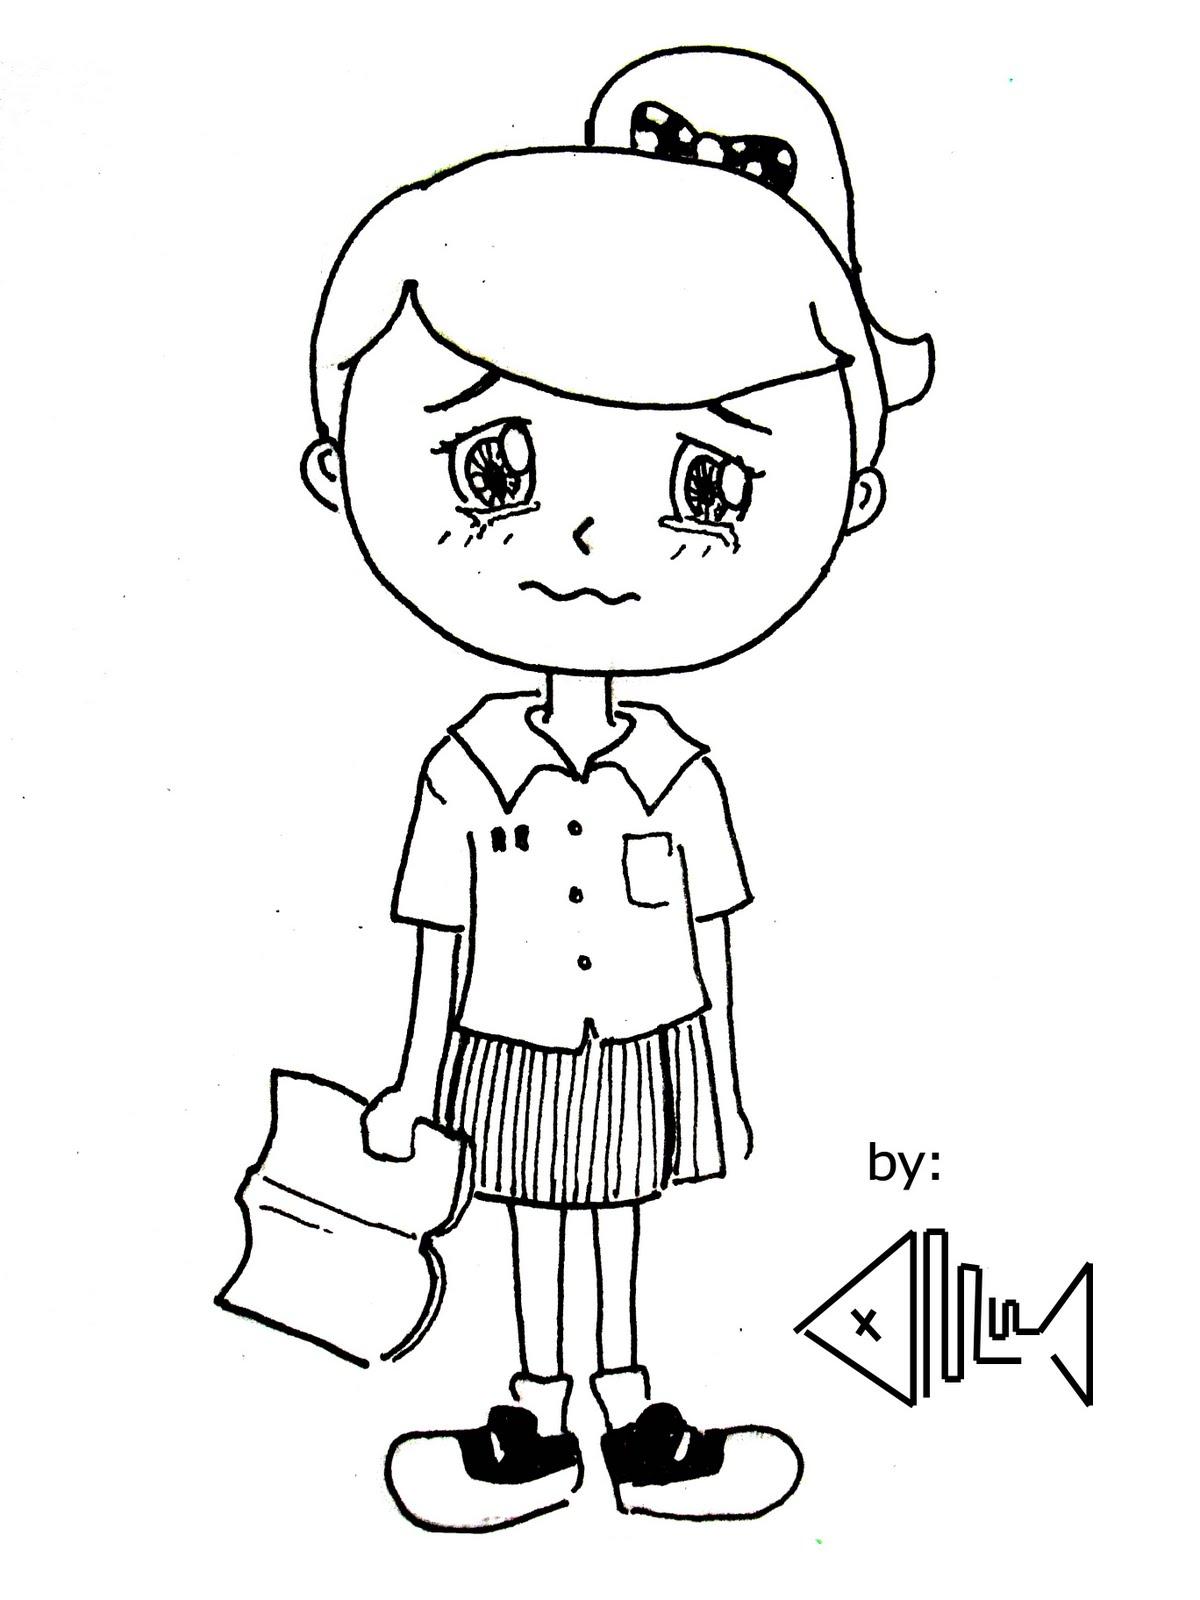 Contoh Gambar Karikatur Yang Gampang Koleksi Gambar Hd